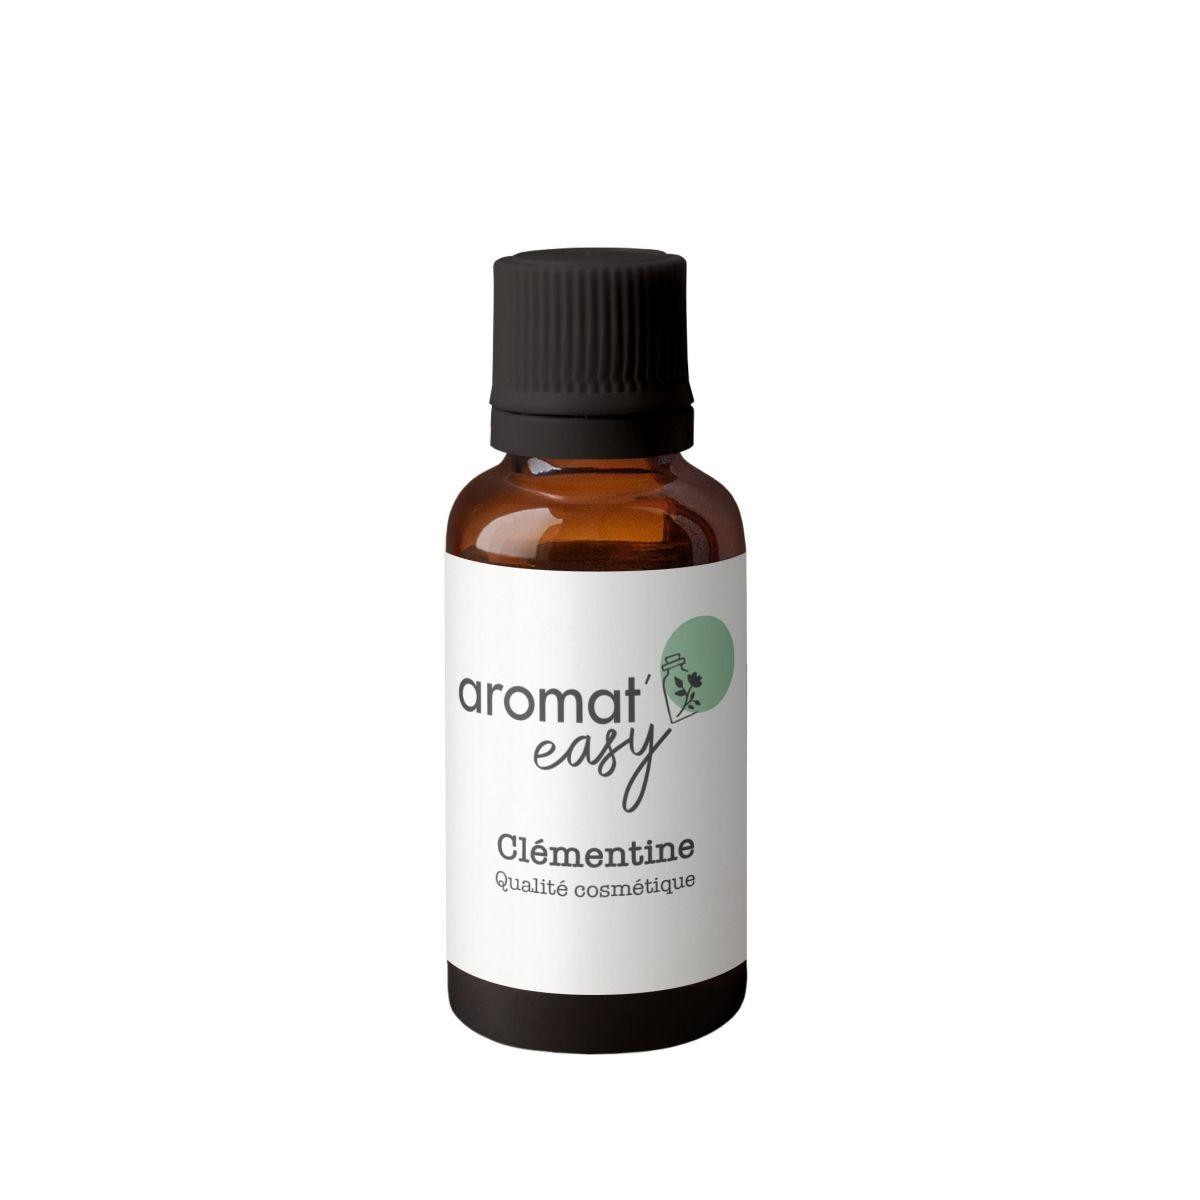 Fragrance Clémentine